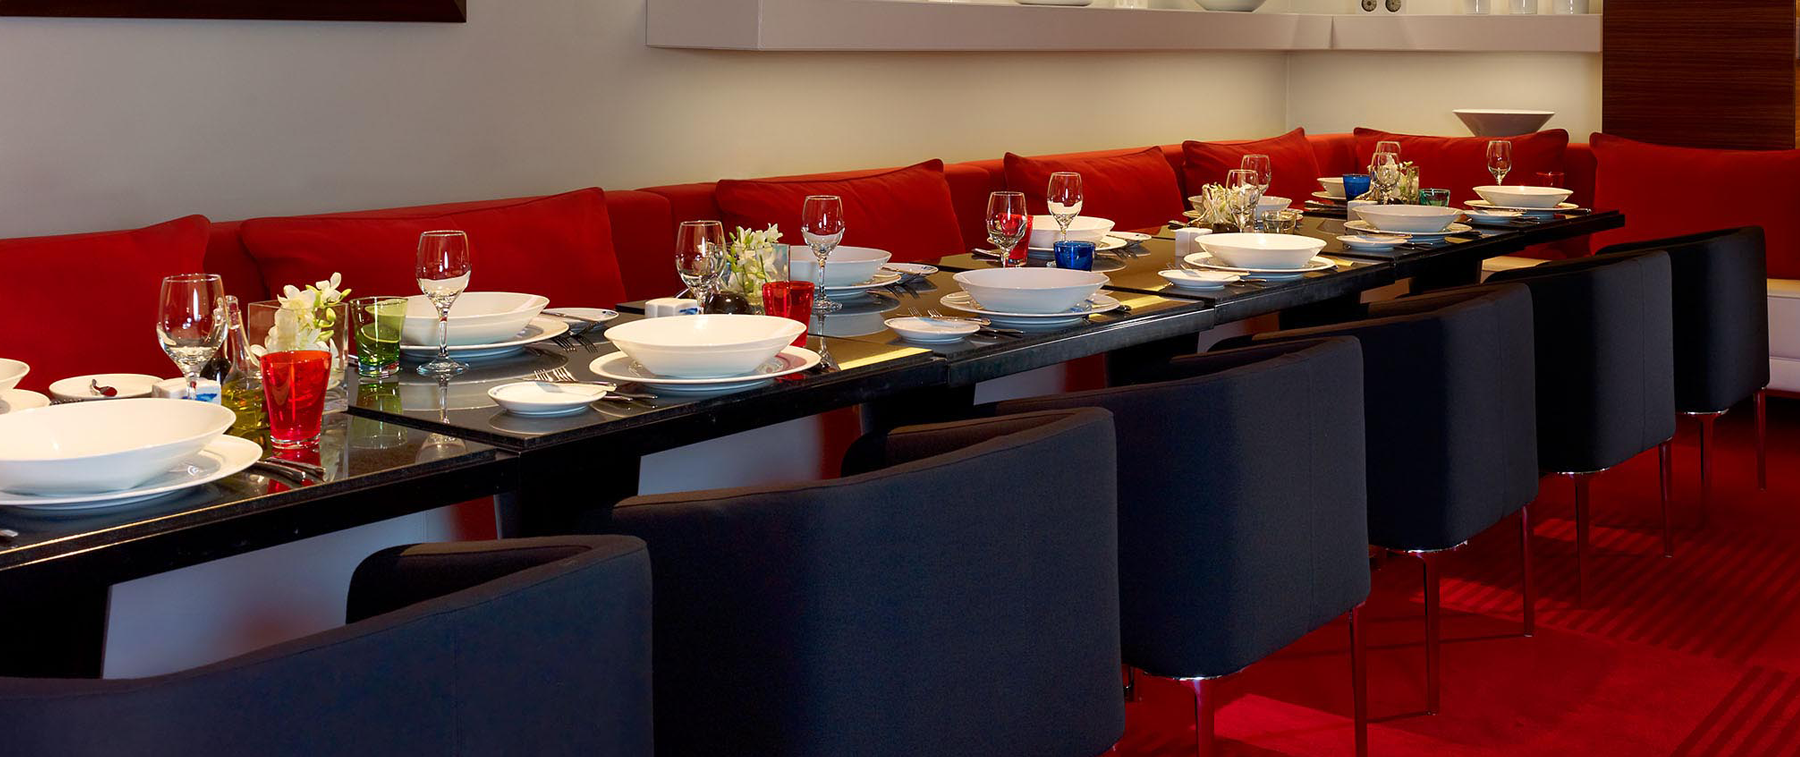 About Italian Restaurant Al Khobar